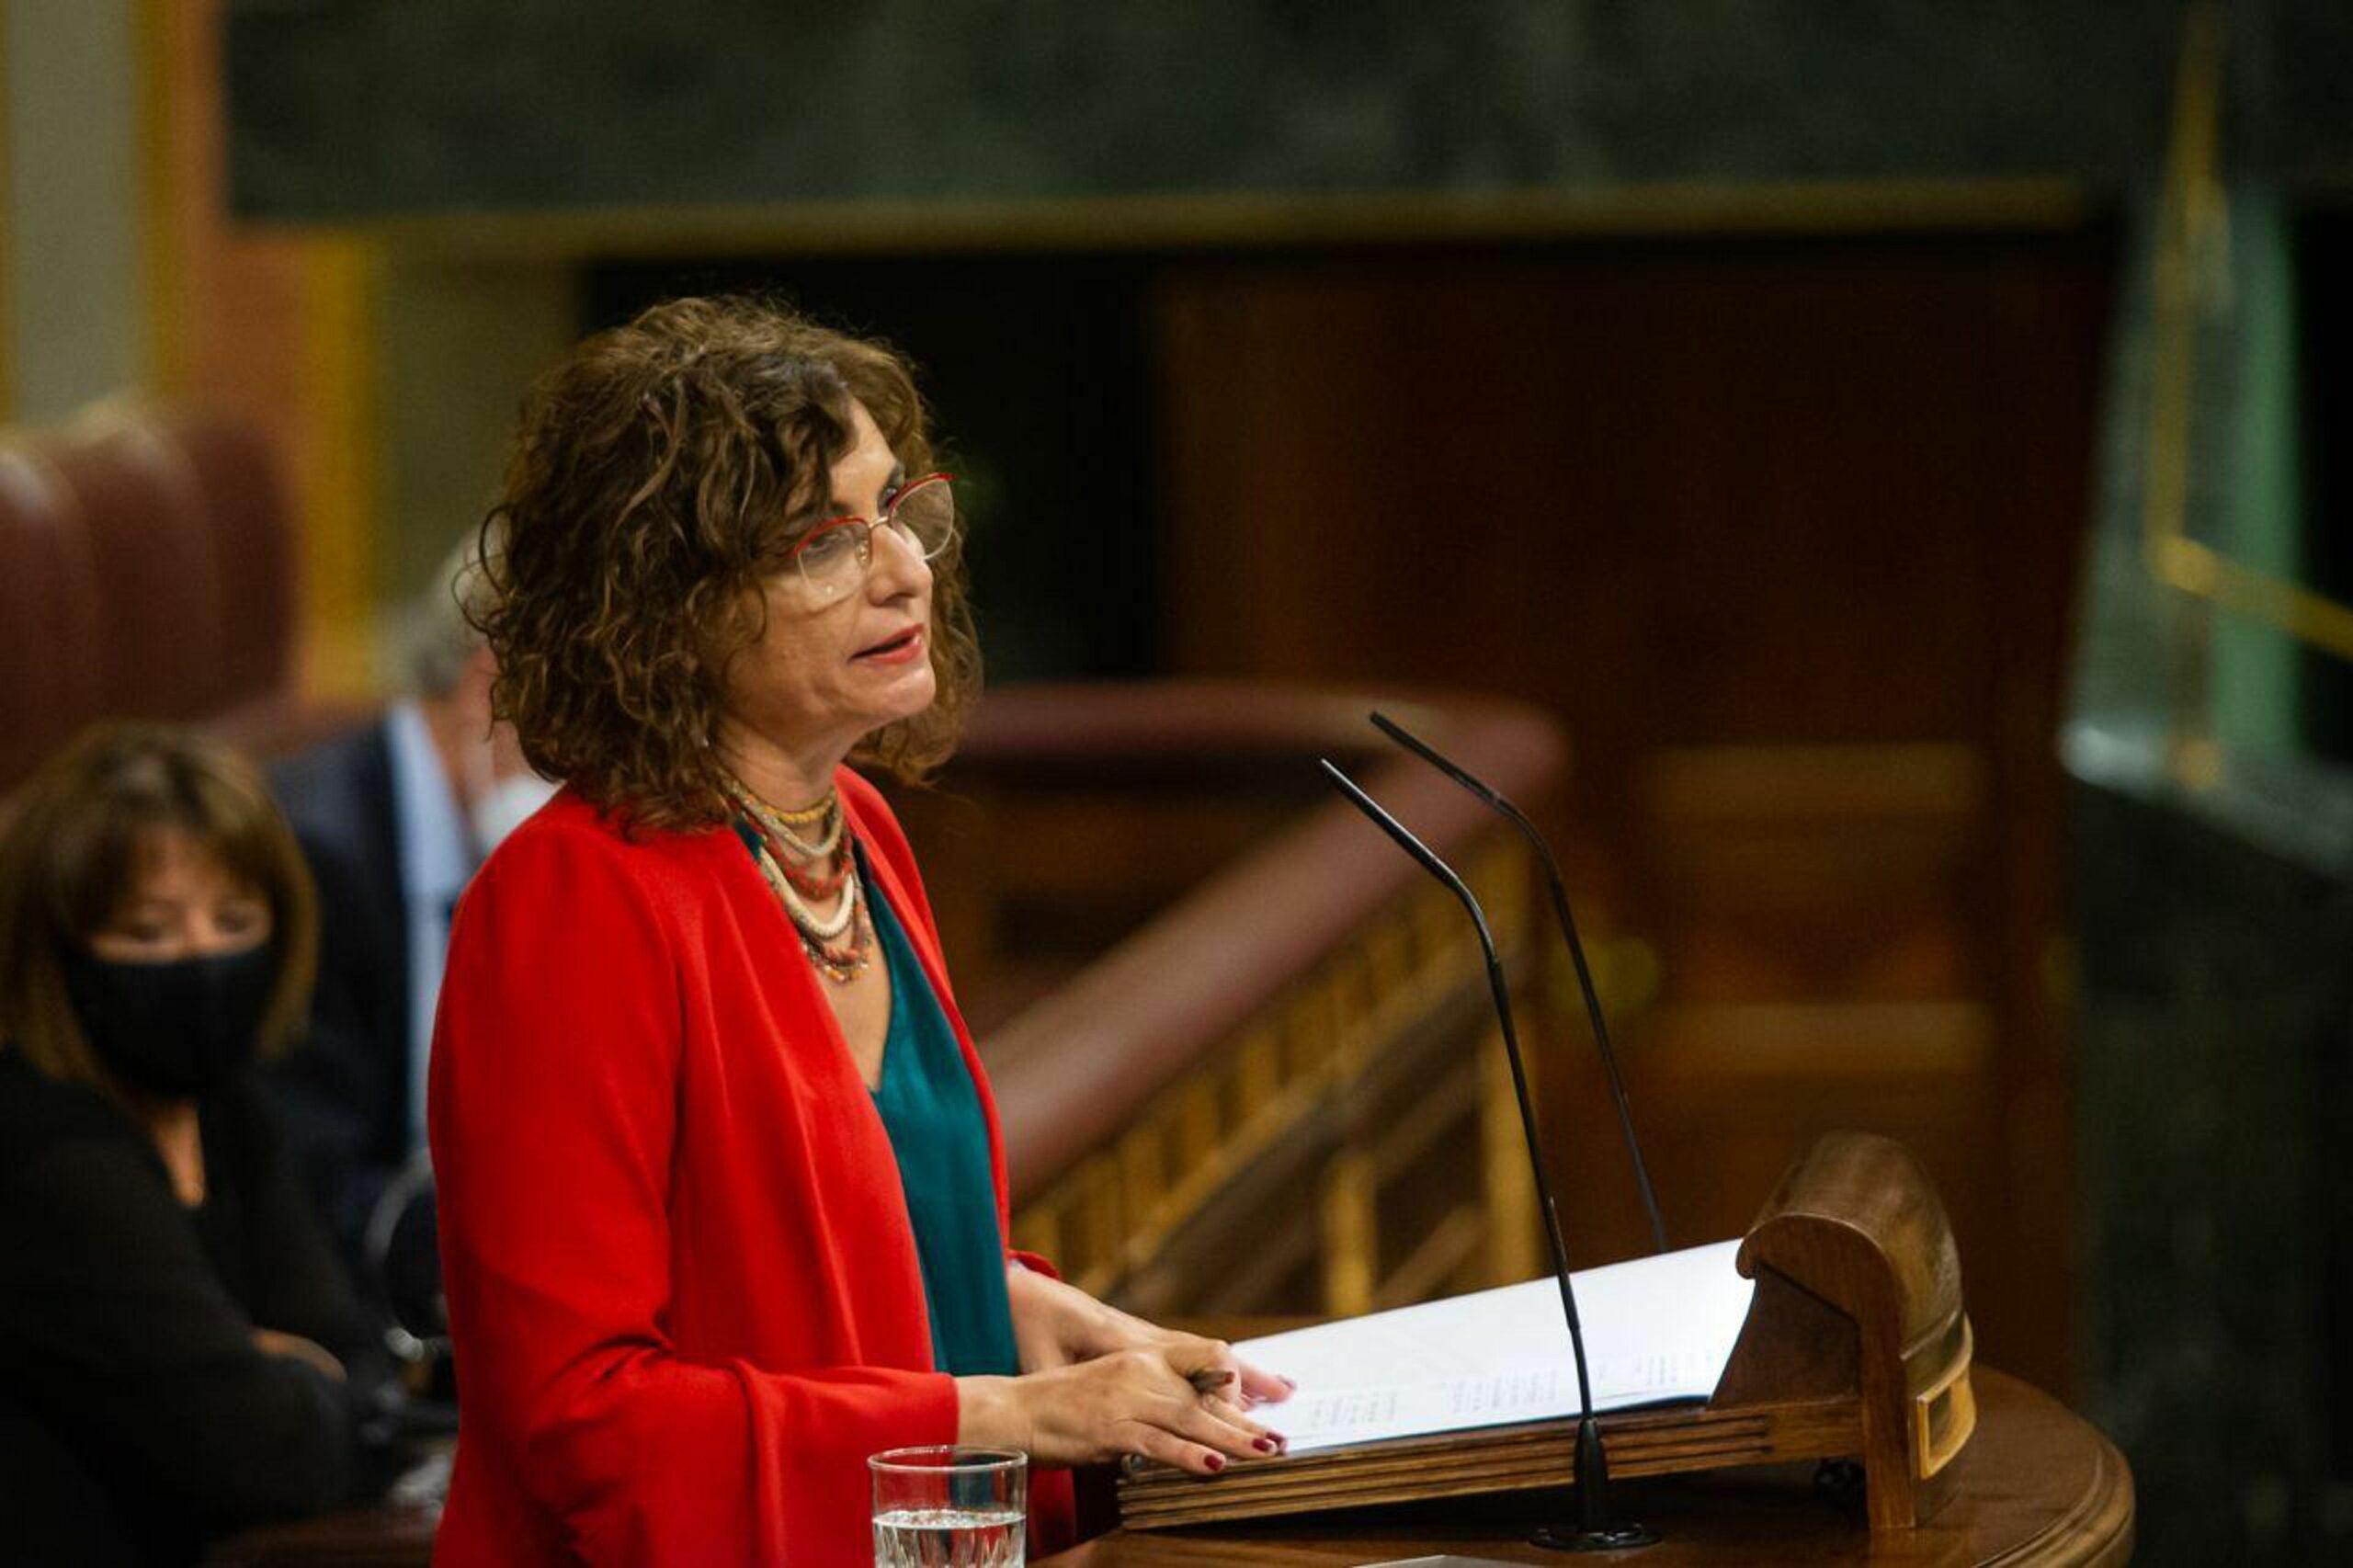 La ministra d'Hisenda, María Jesús Montero / ACN